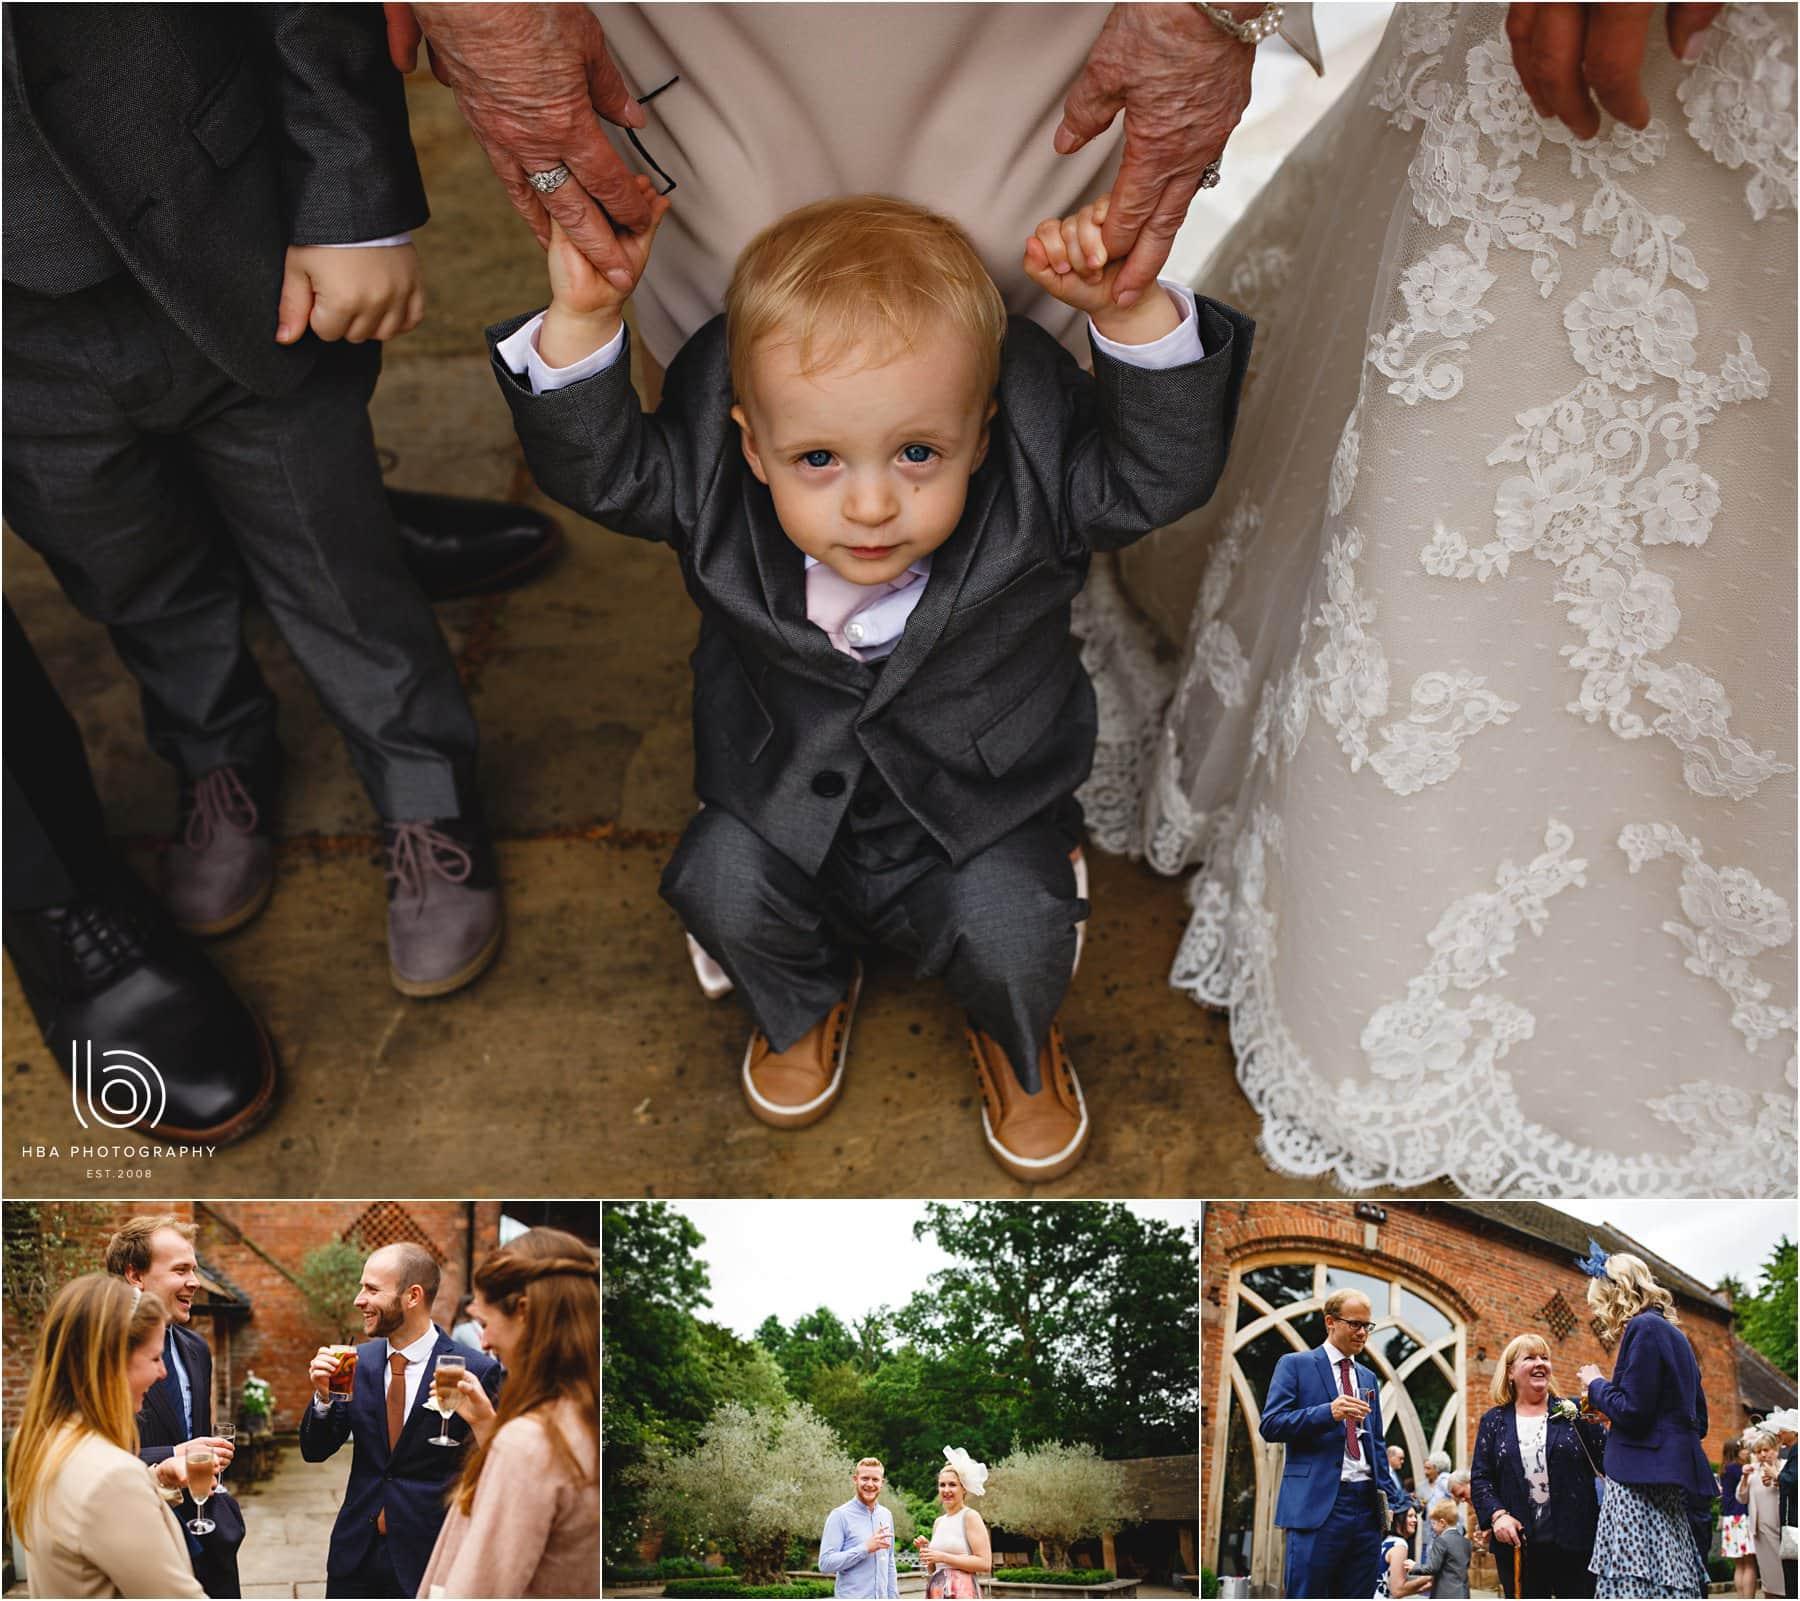 the bride & groom's guests